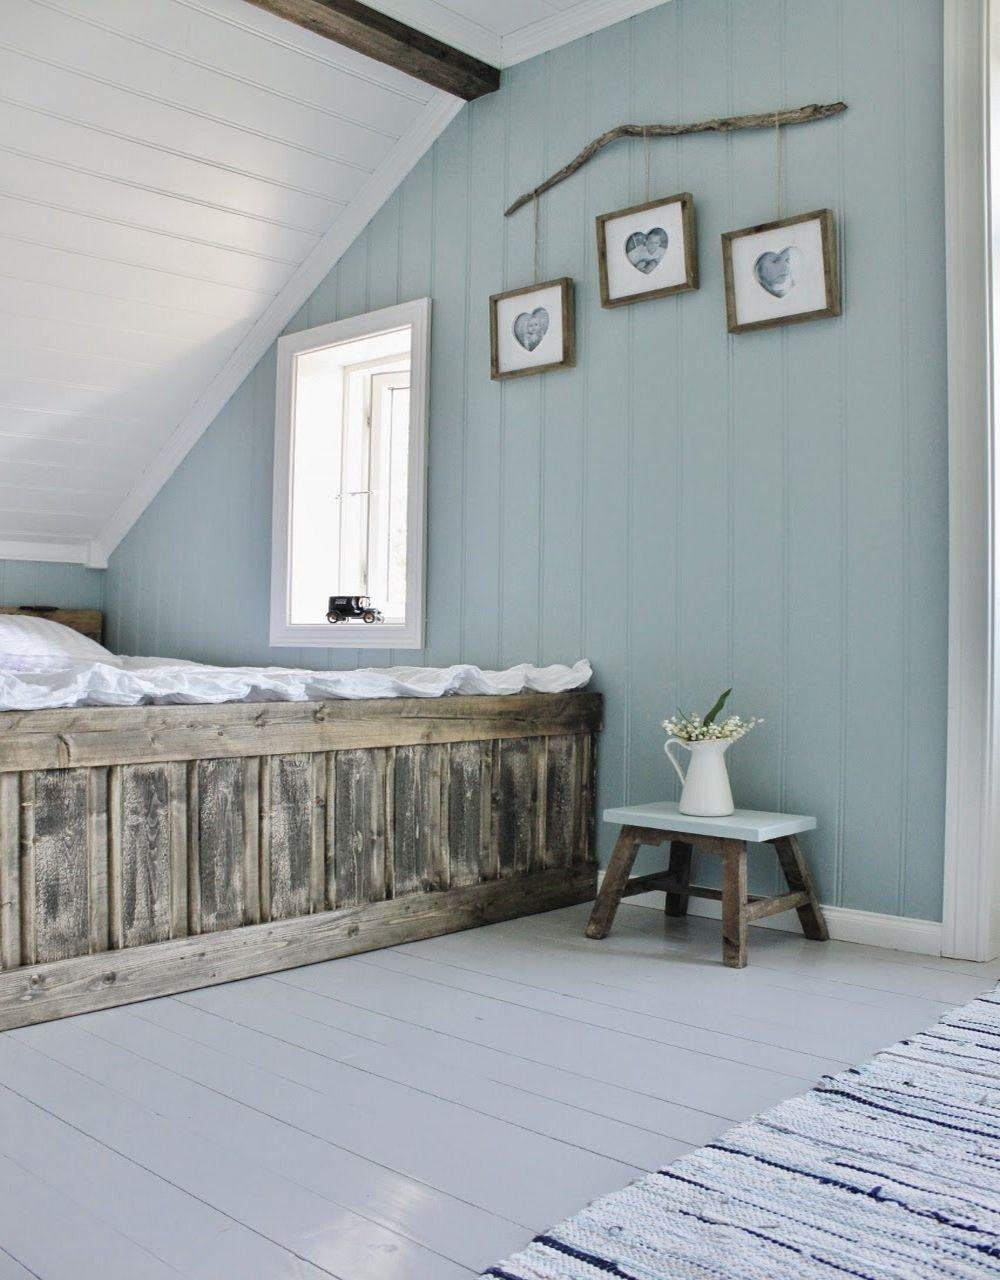 Living Room Wood Paneling Makeover: Pin By SugarPlumDolls.com On Auburn Street House Remodel